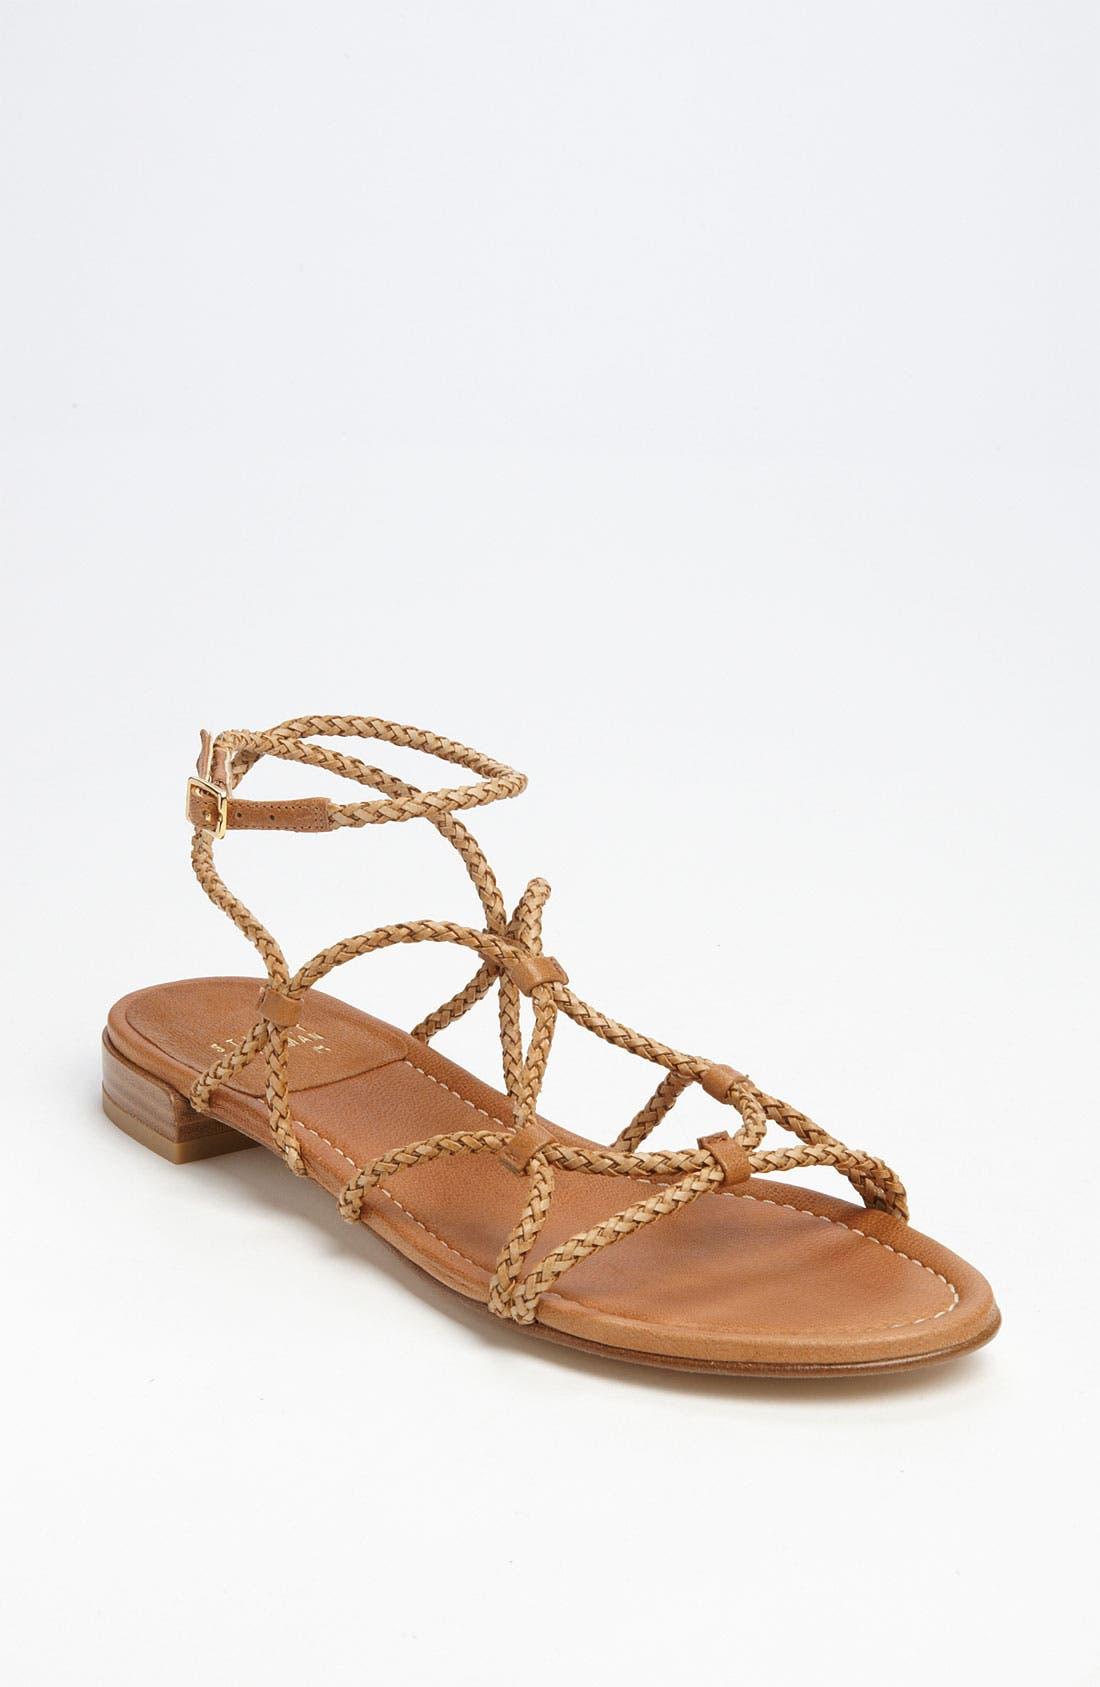 Alternate Image 1 Selected - Stuart Weitzman 'Cordy' Sandal